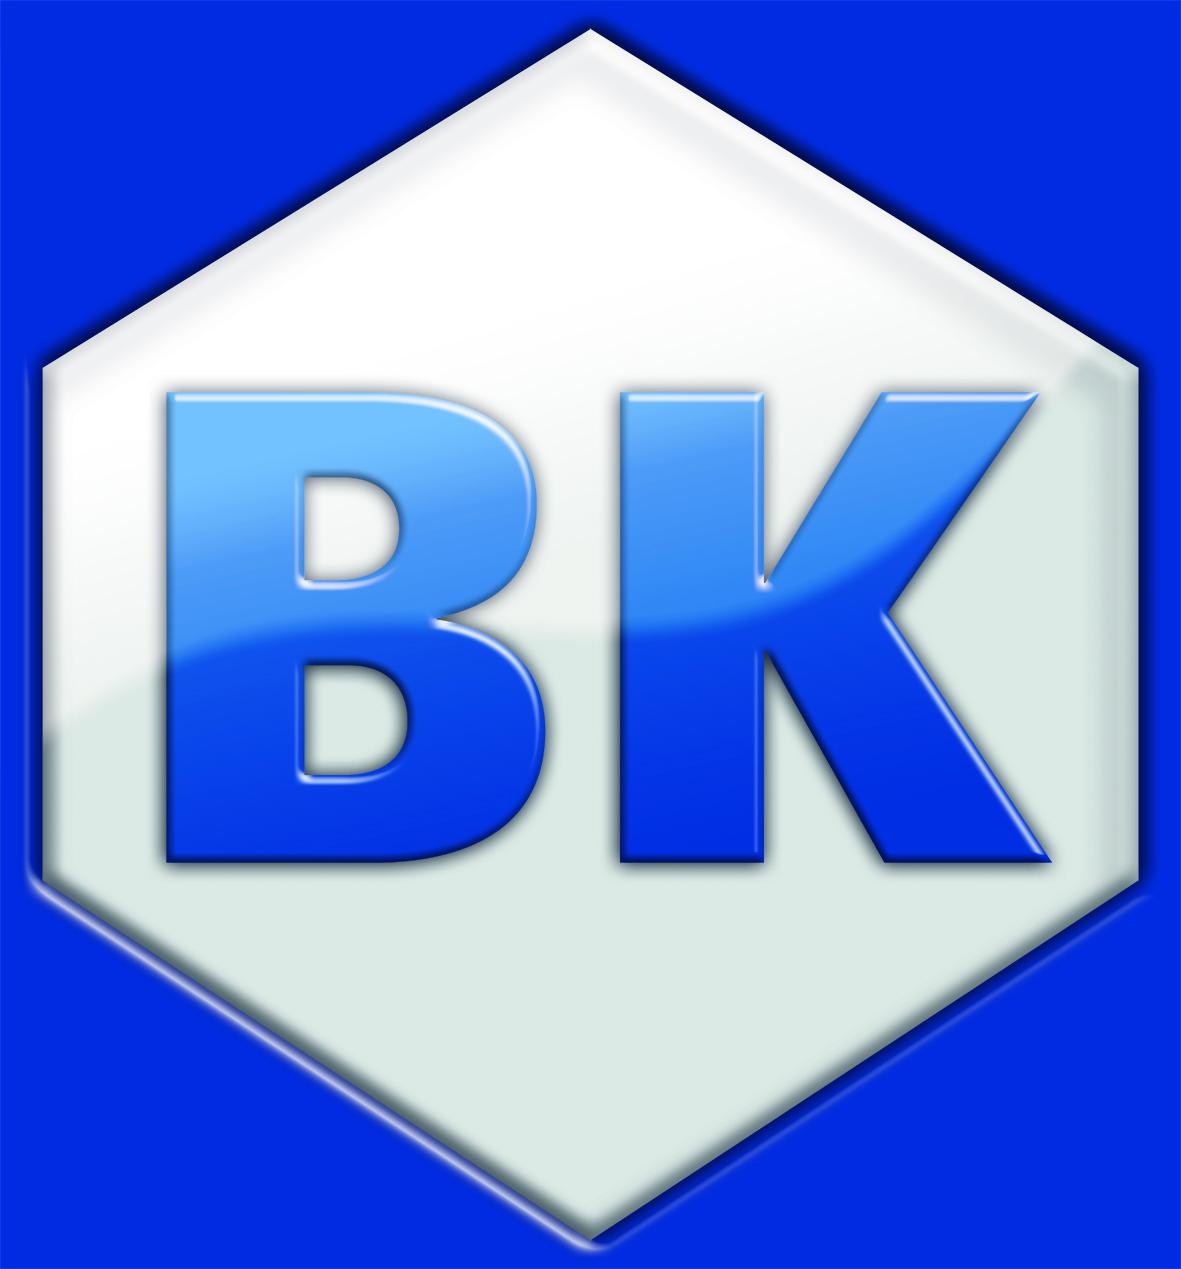 BK_LOGO_05_Vektor_4c